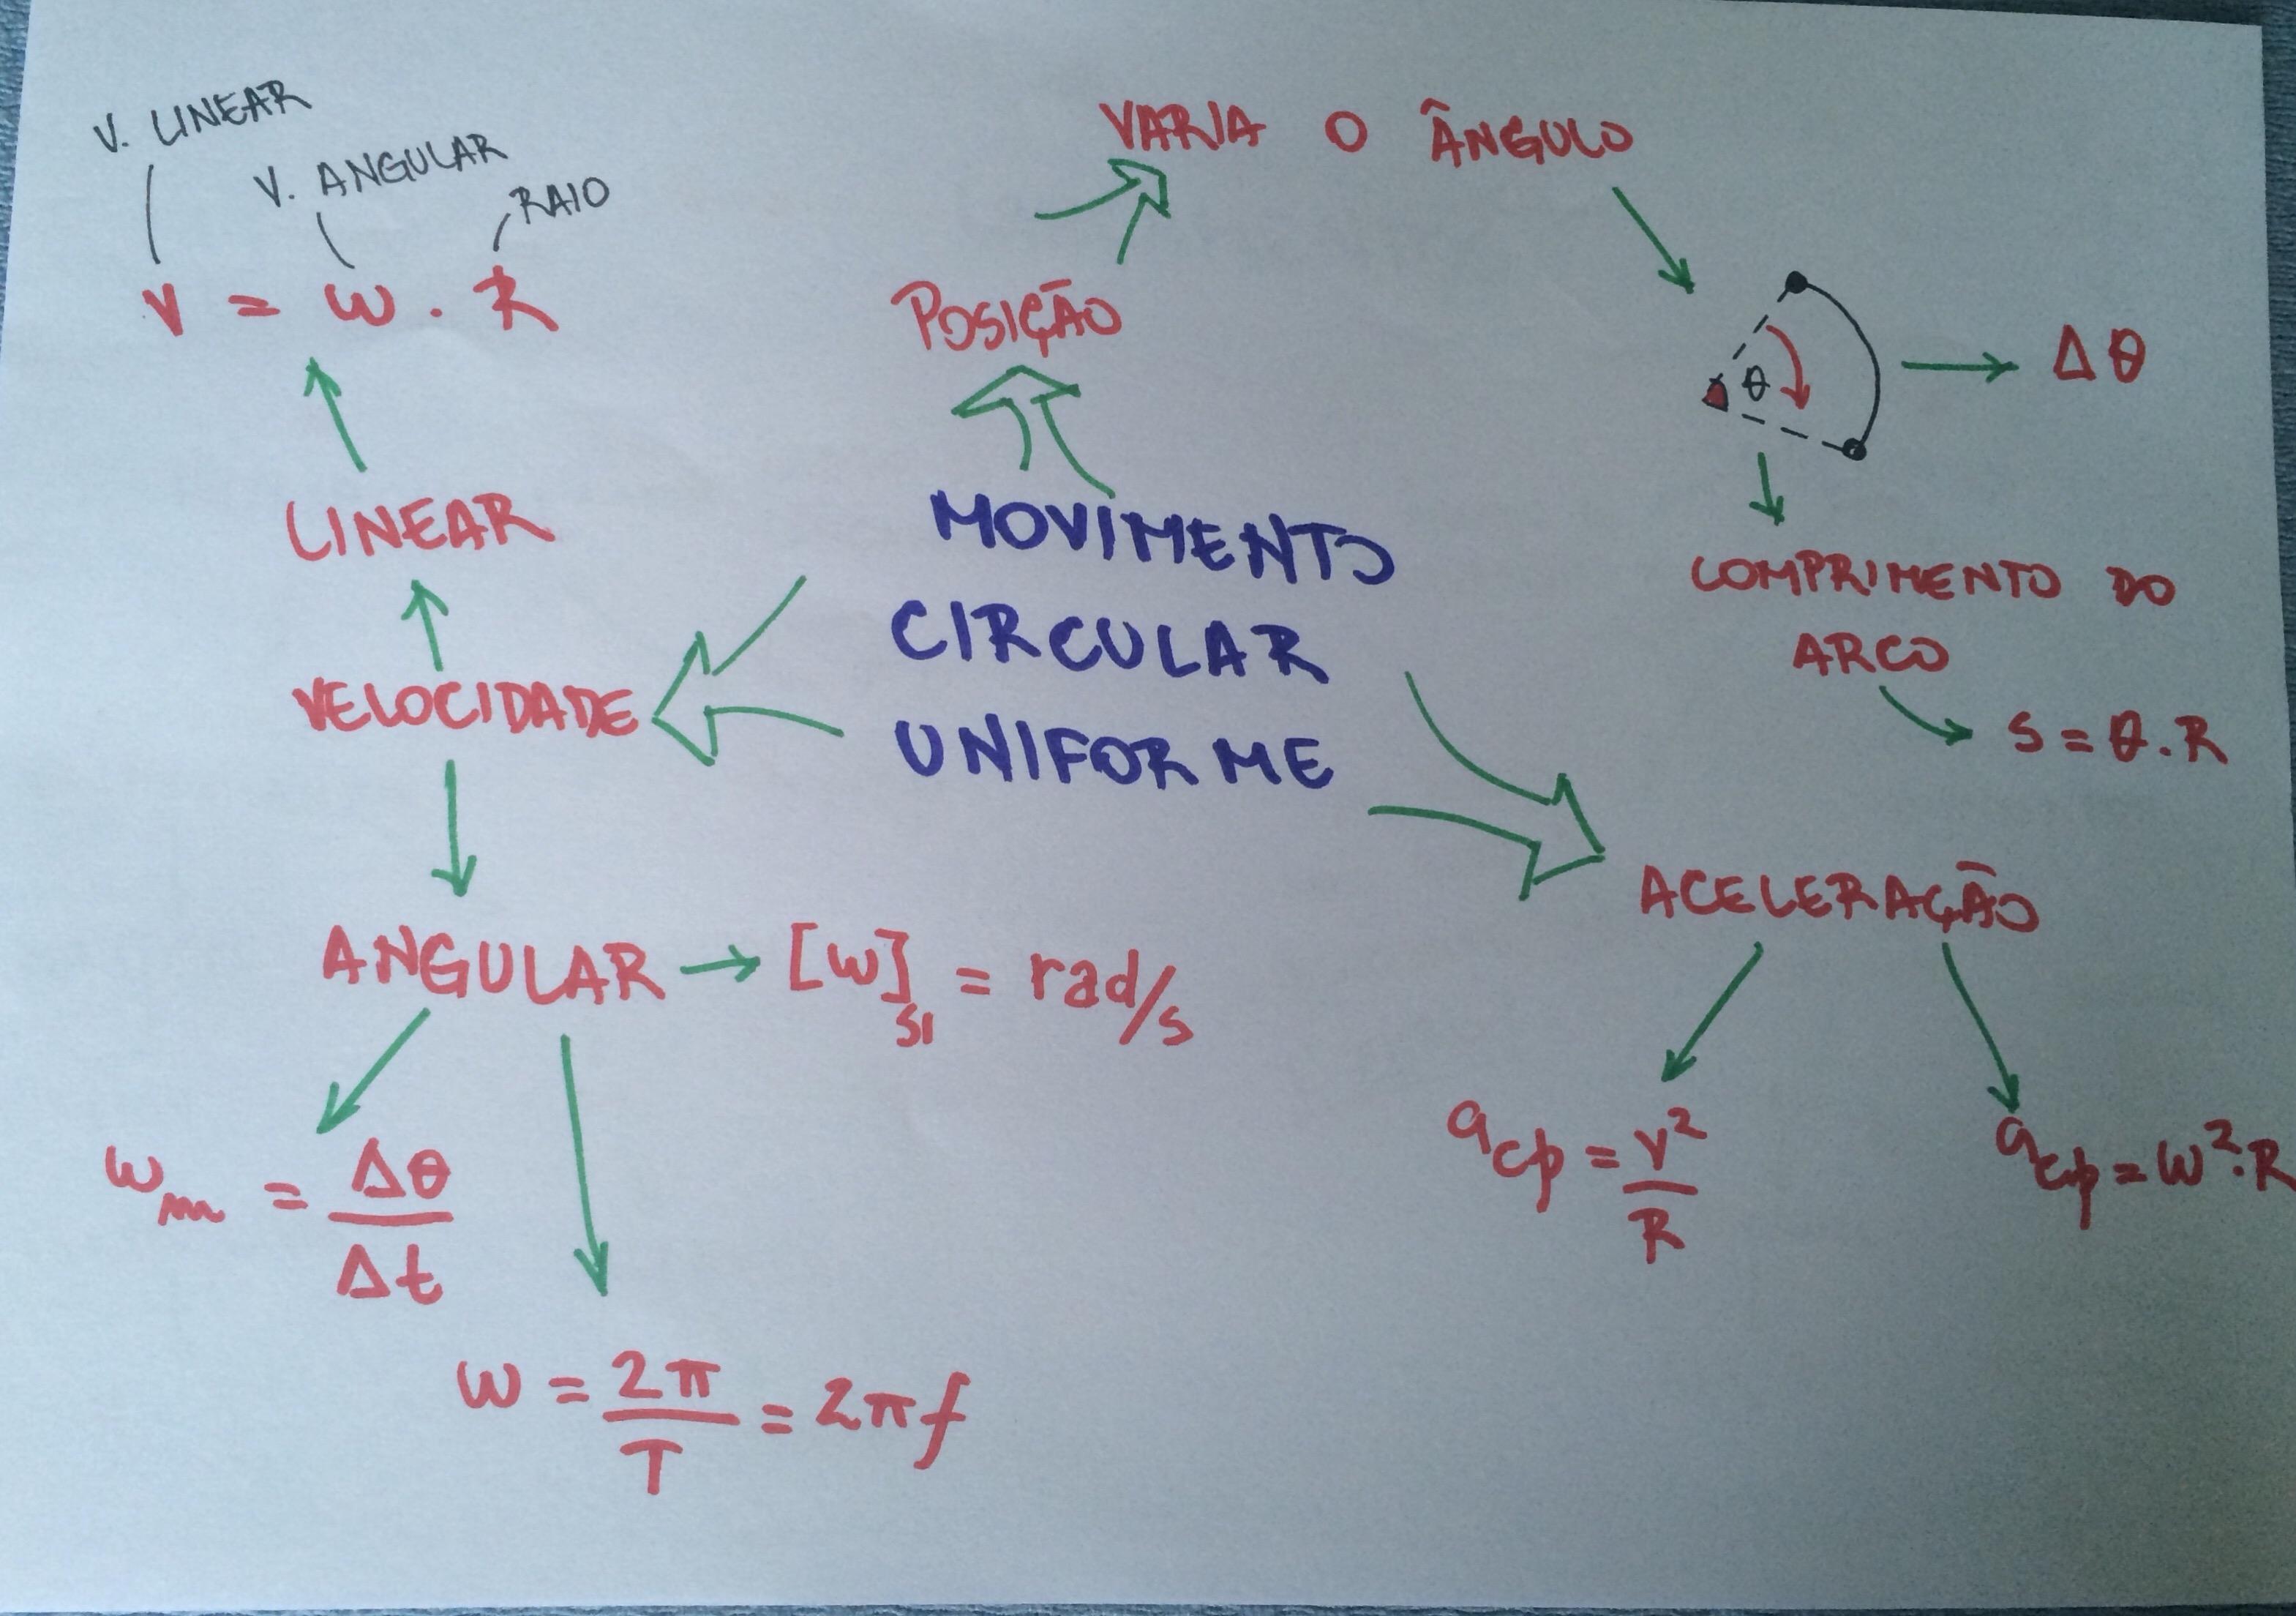 Mapa Mental: Movimento Circular Uniforme